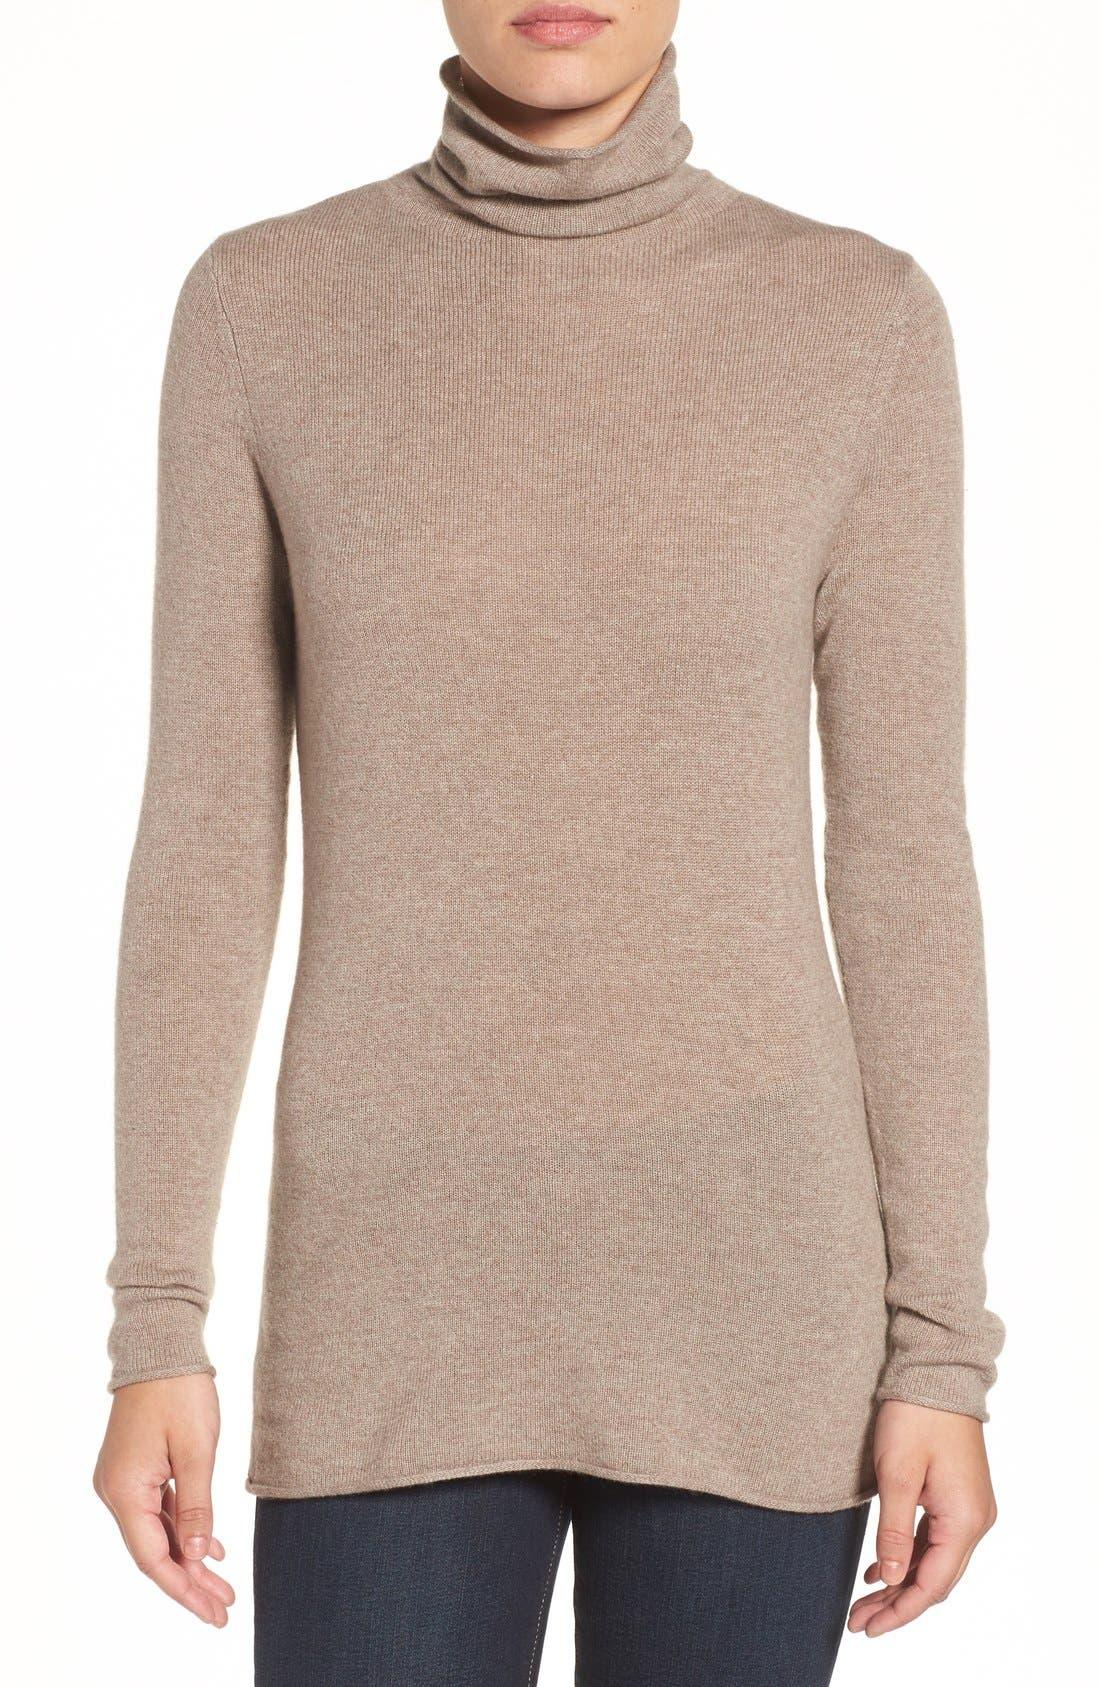 Alternate Image 1 Selected - Halogen® Wool & Cashmere Funnel Neck Sweater (Regular & Petite)